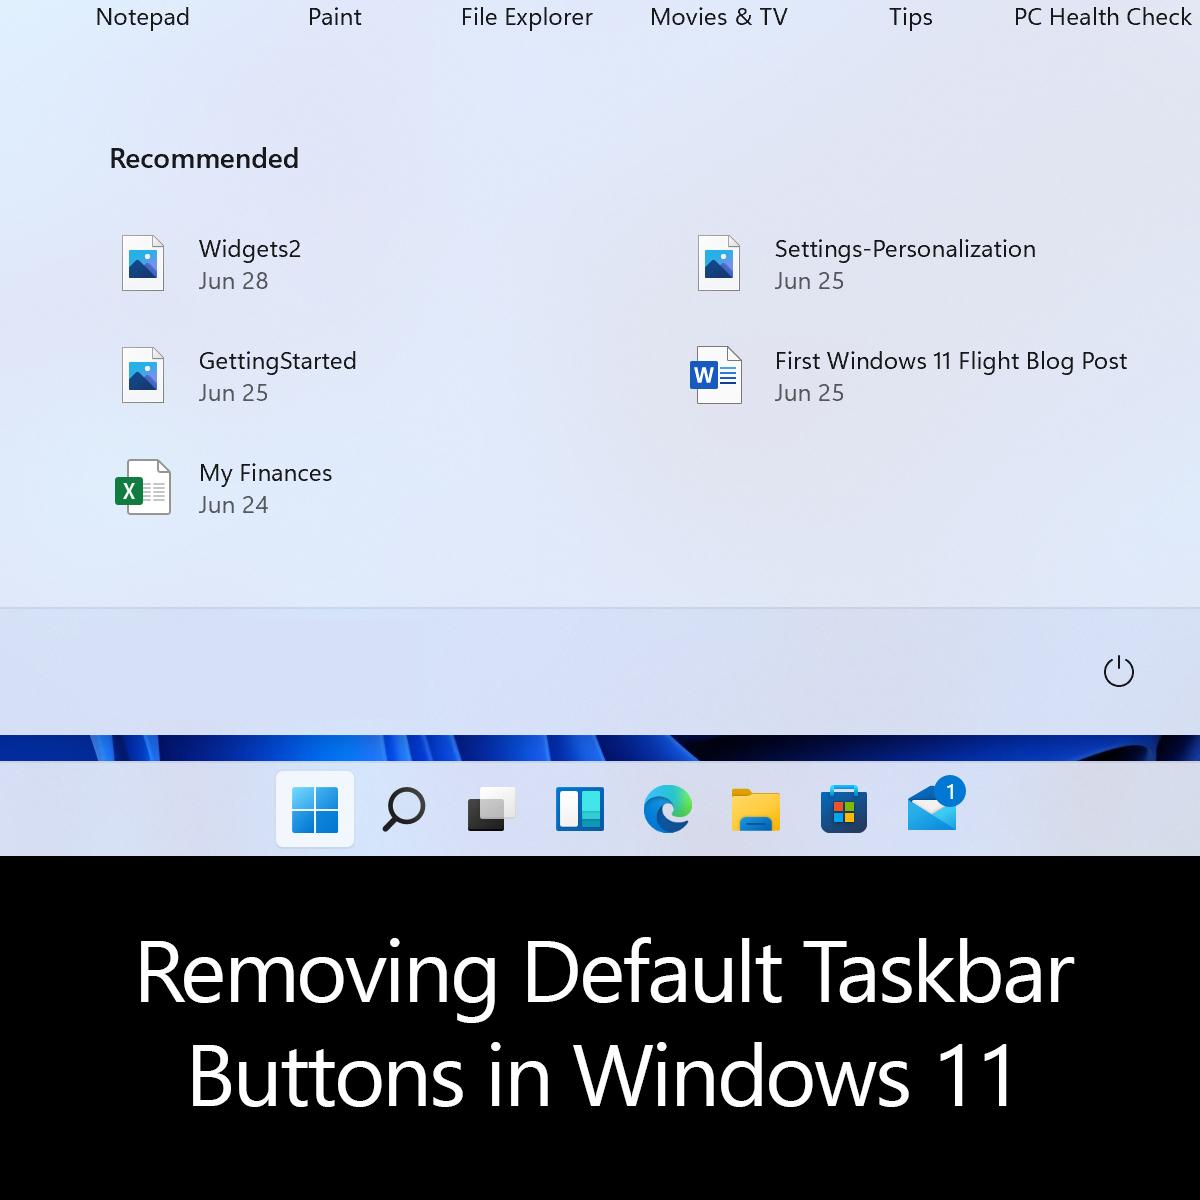 Removing Default Taskbar Buttons in Windows 11